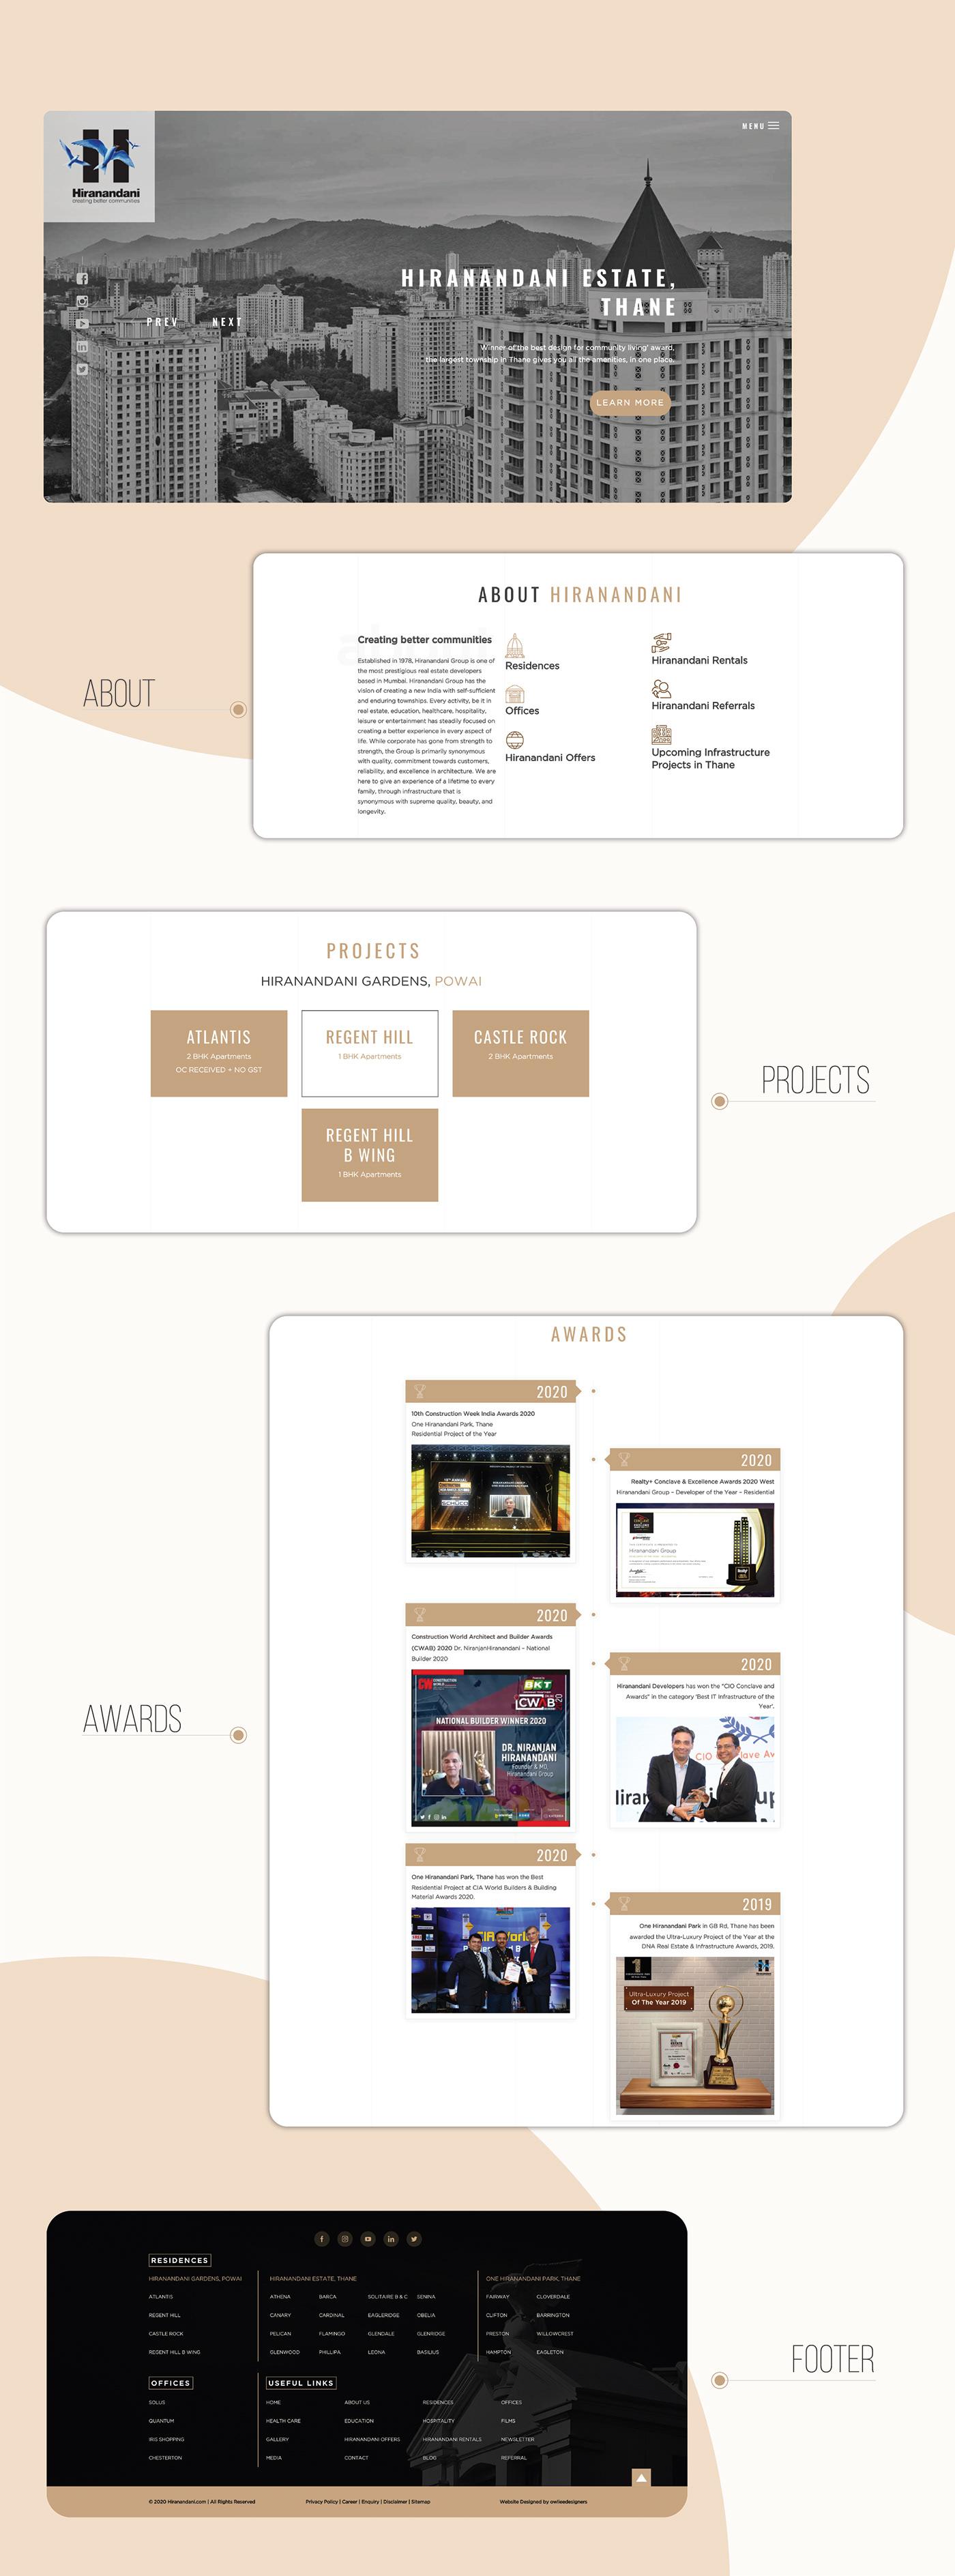 graphic design  Layout Design Product Desiging Prototyping Real Estate Website UI UX designing web designing Website Design wireframing